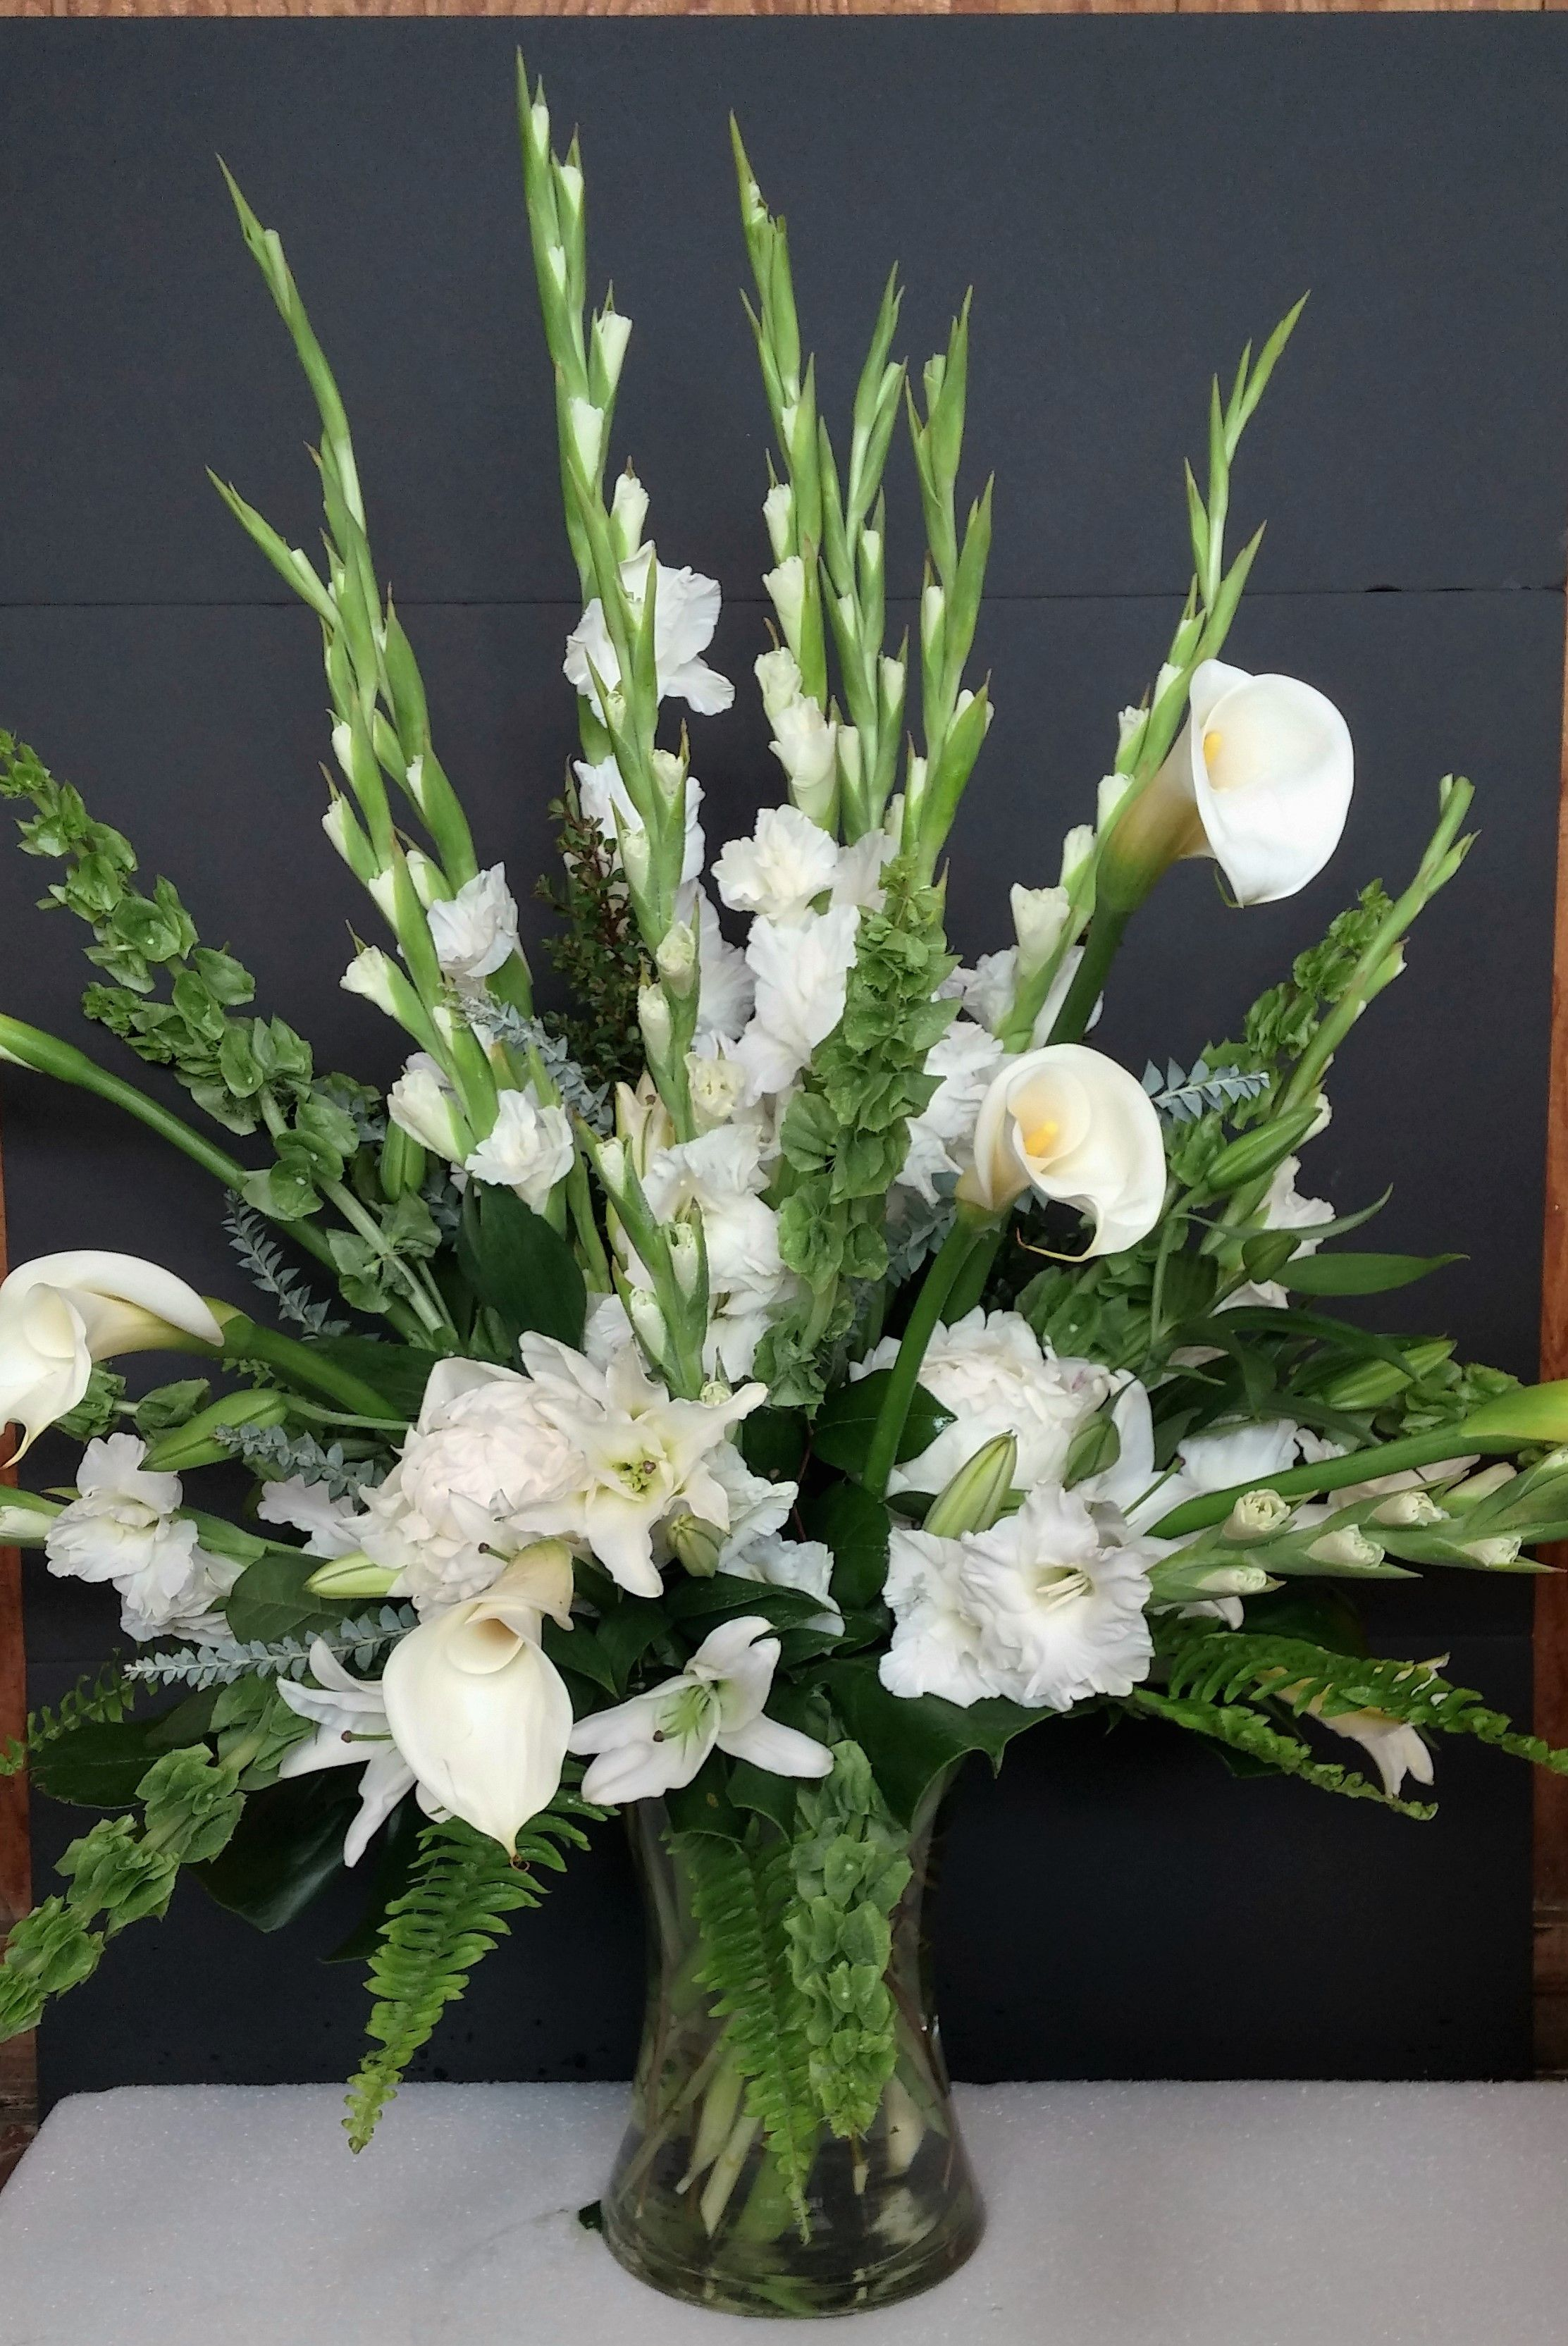 Elegant Sympathy Arrangement Calla Lilies Bells Of Ireland Lilies Gladiolus Flower Arrangements Calla Lily Wedding Centerpiece Gladiolus Centerpiece